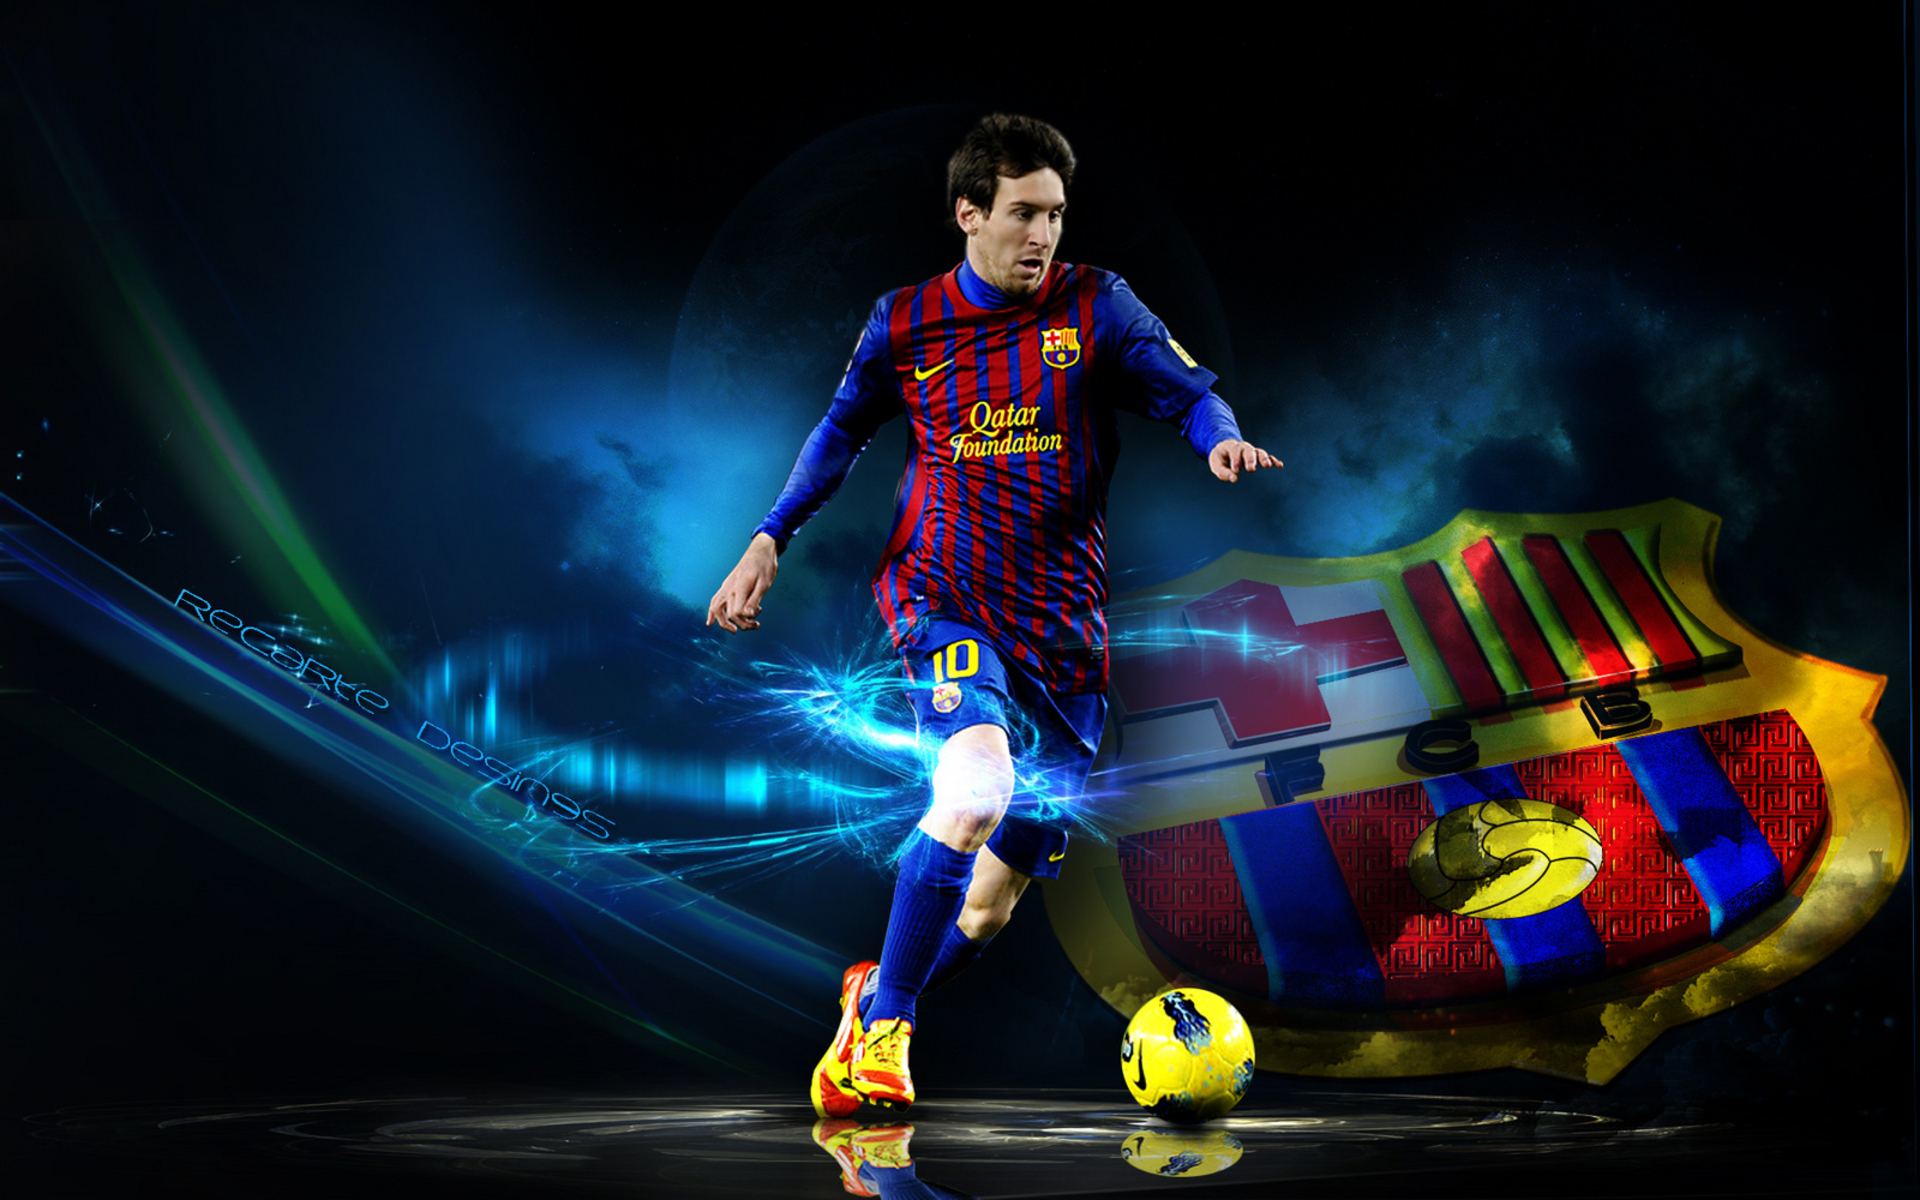 Messi Football Wallpapers HD 1920x1200